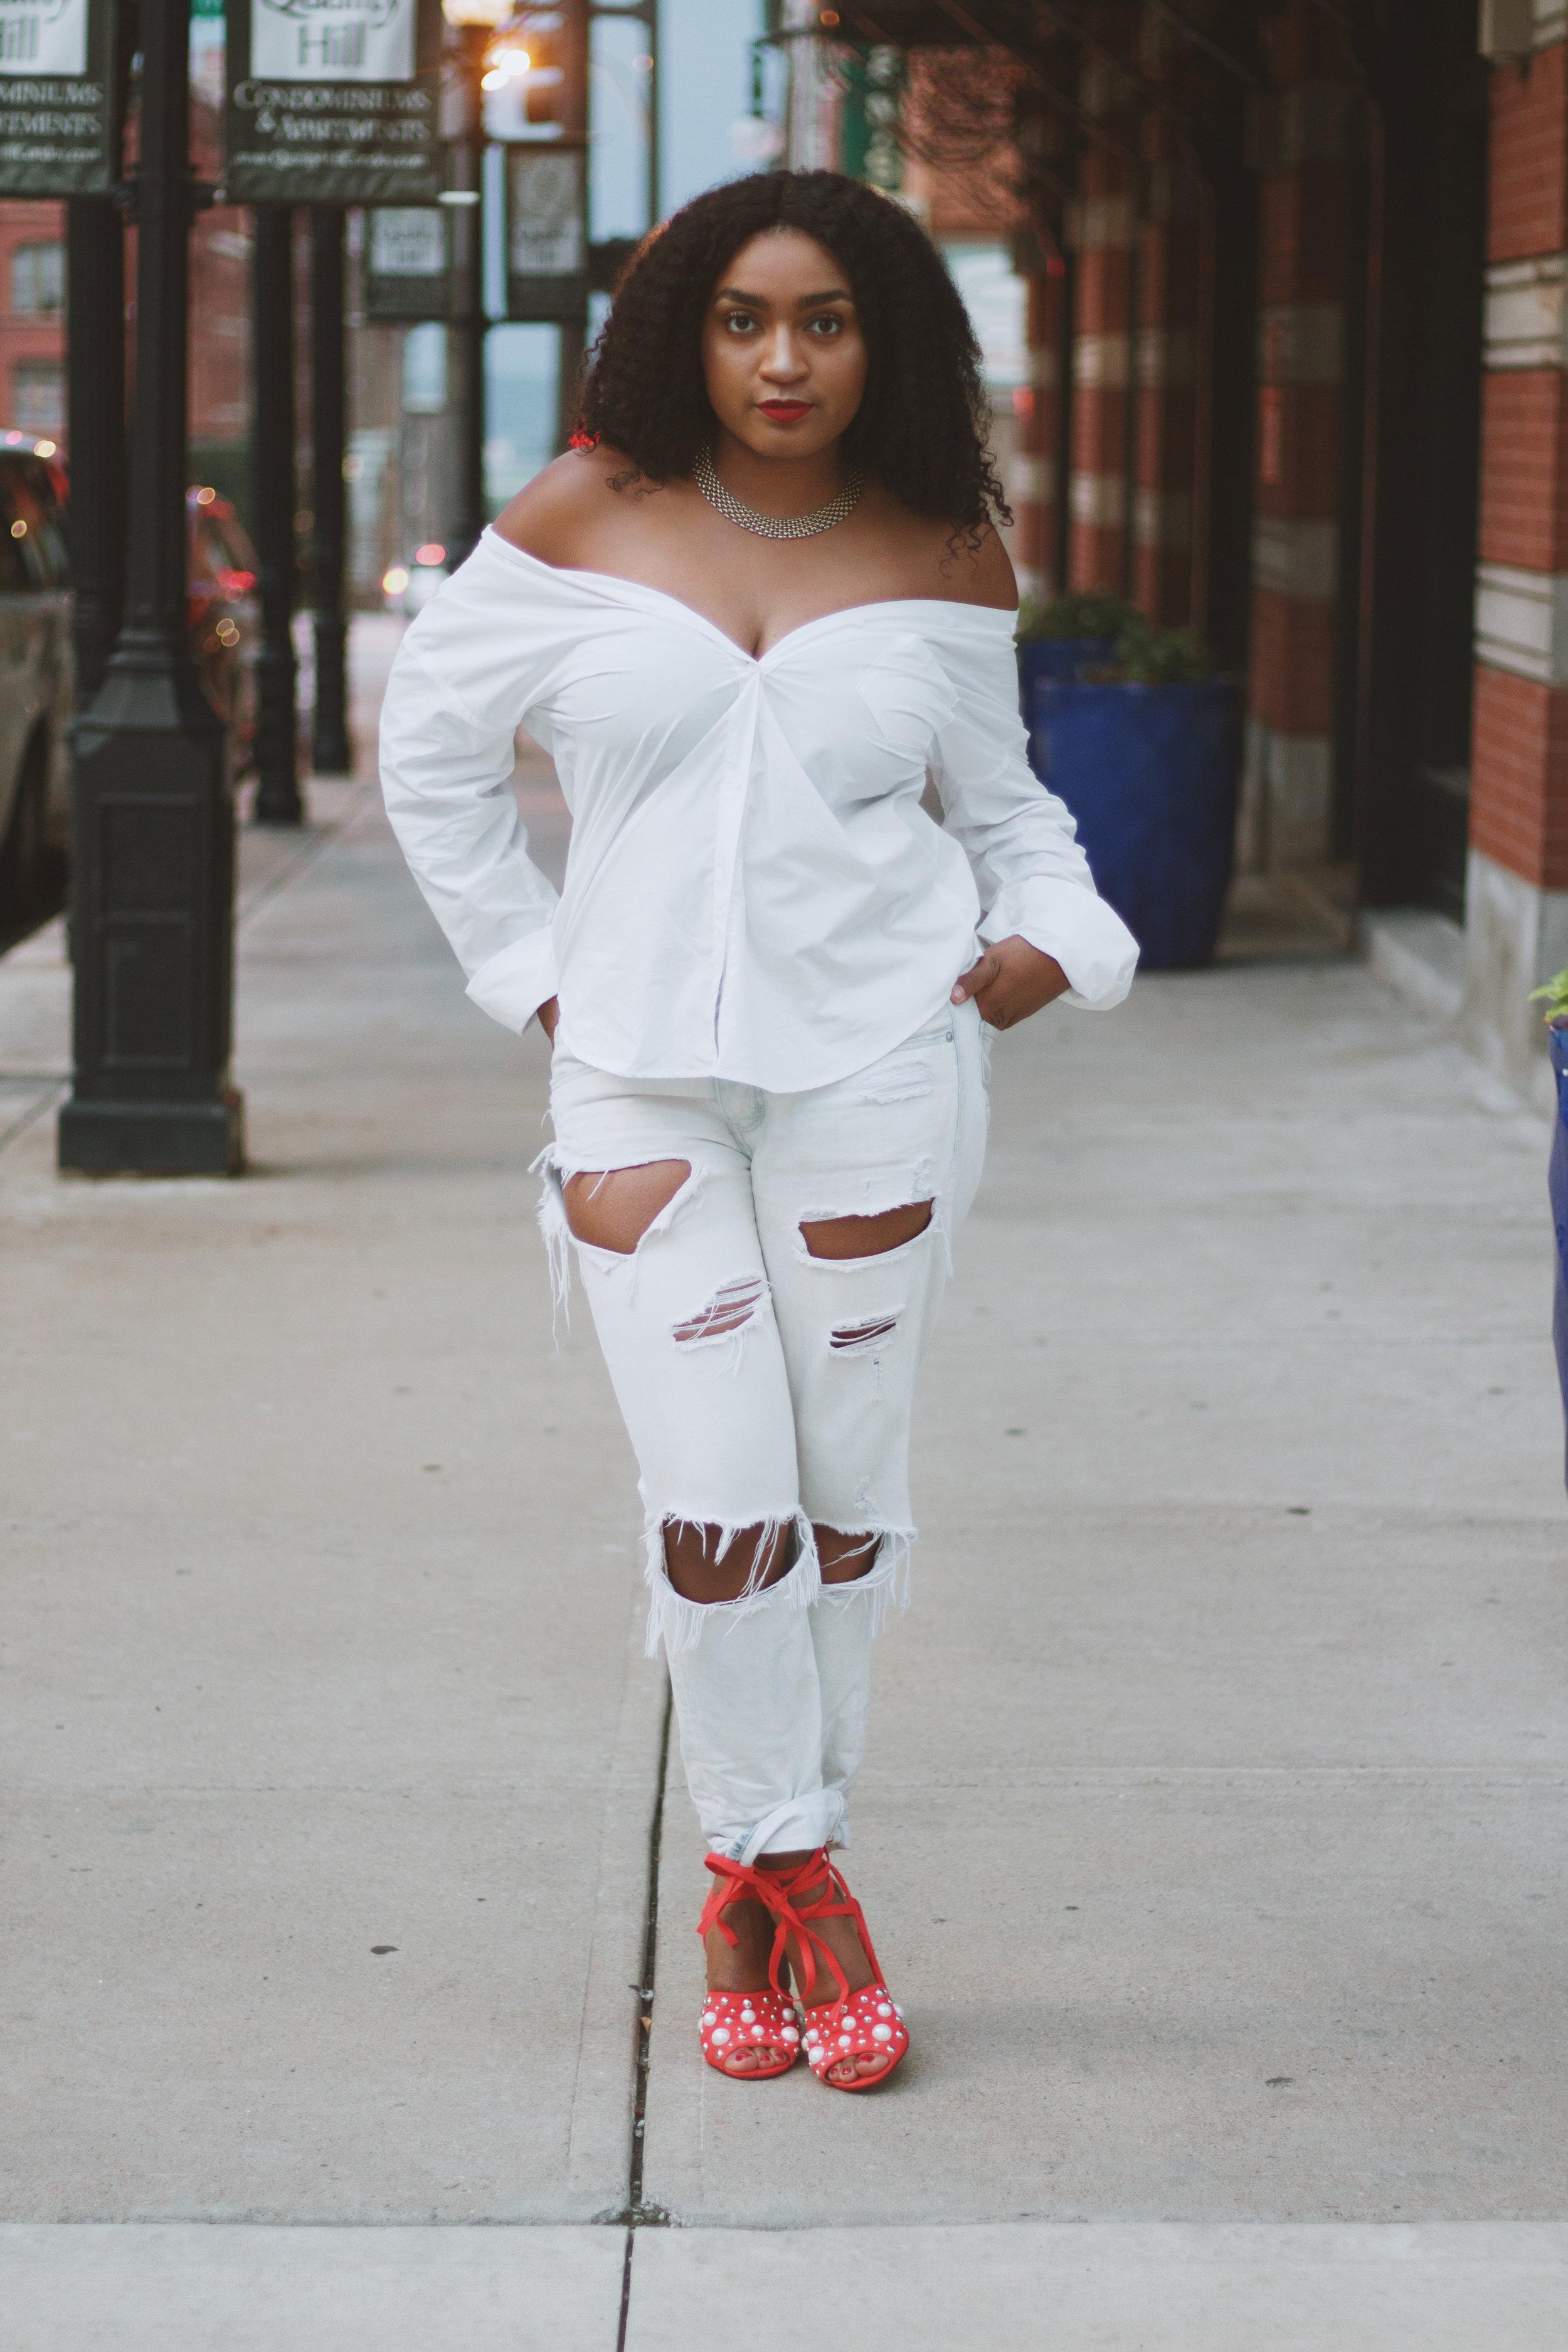 Big hair and block heels on fashion blogger Jasmine Diane.